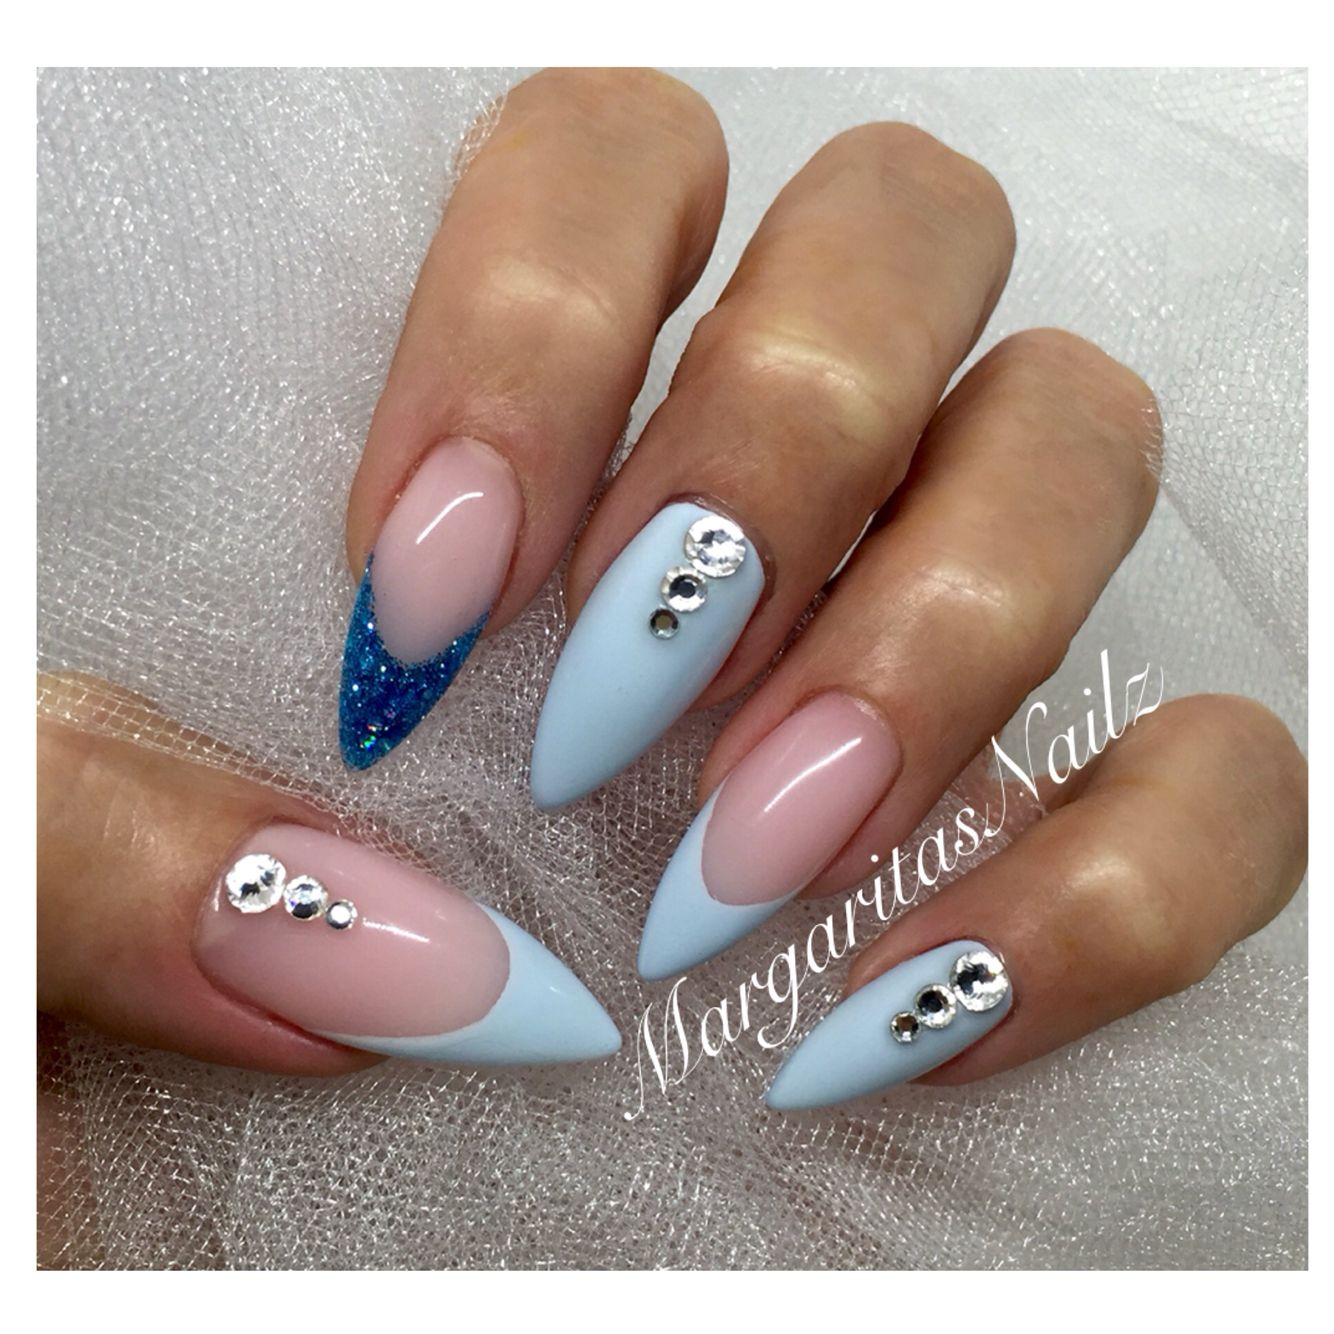 baby blue stiletto nails margaritasnailz lovely hands feet in 2018 pinterest n gel. Black Bedroom Furniture Sets. Home Design Ideas